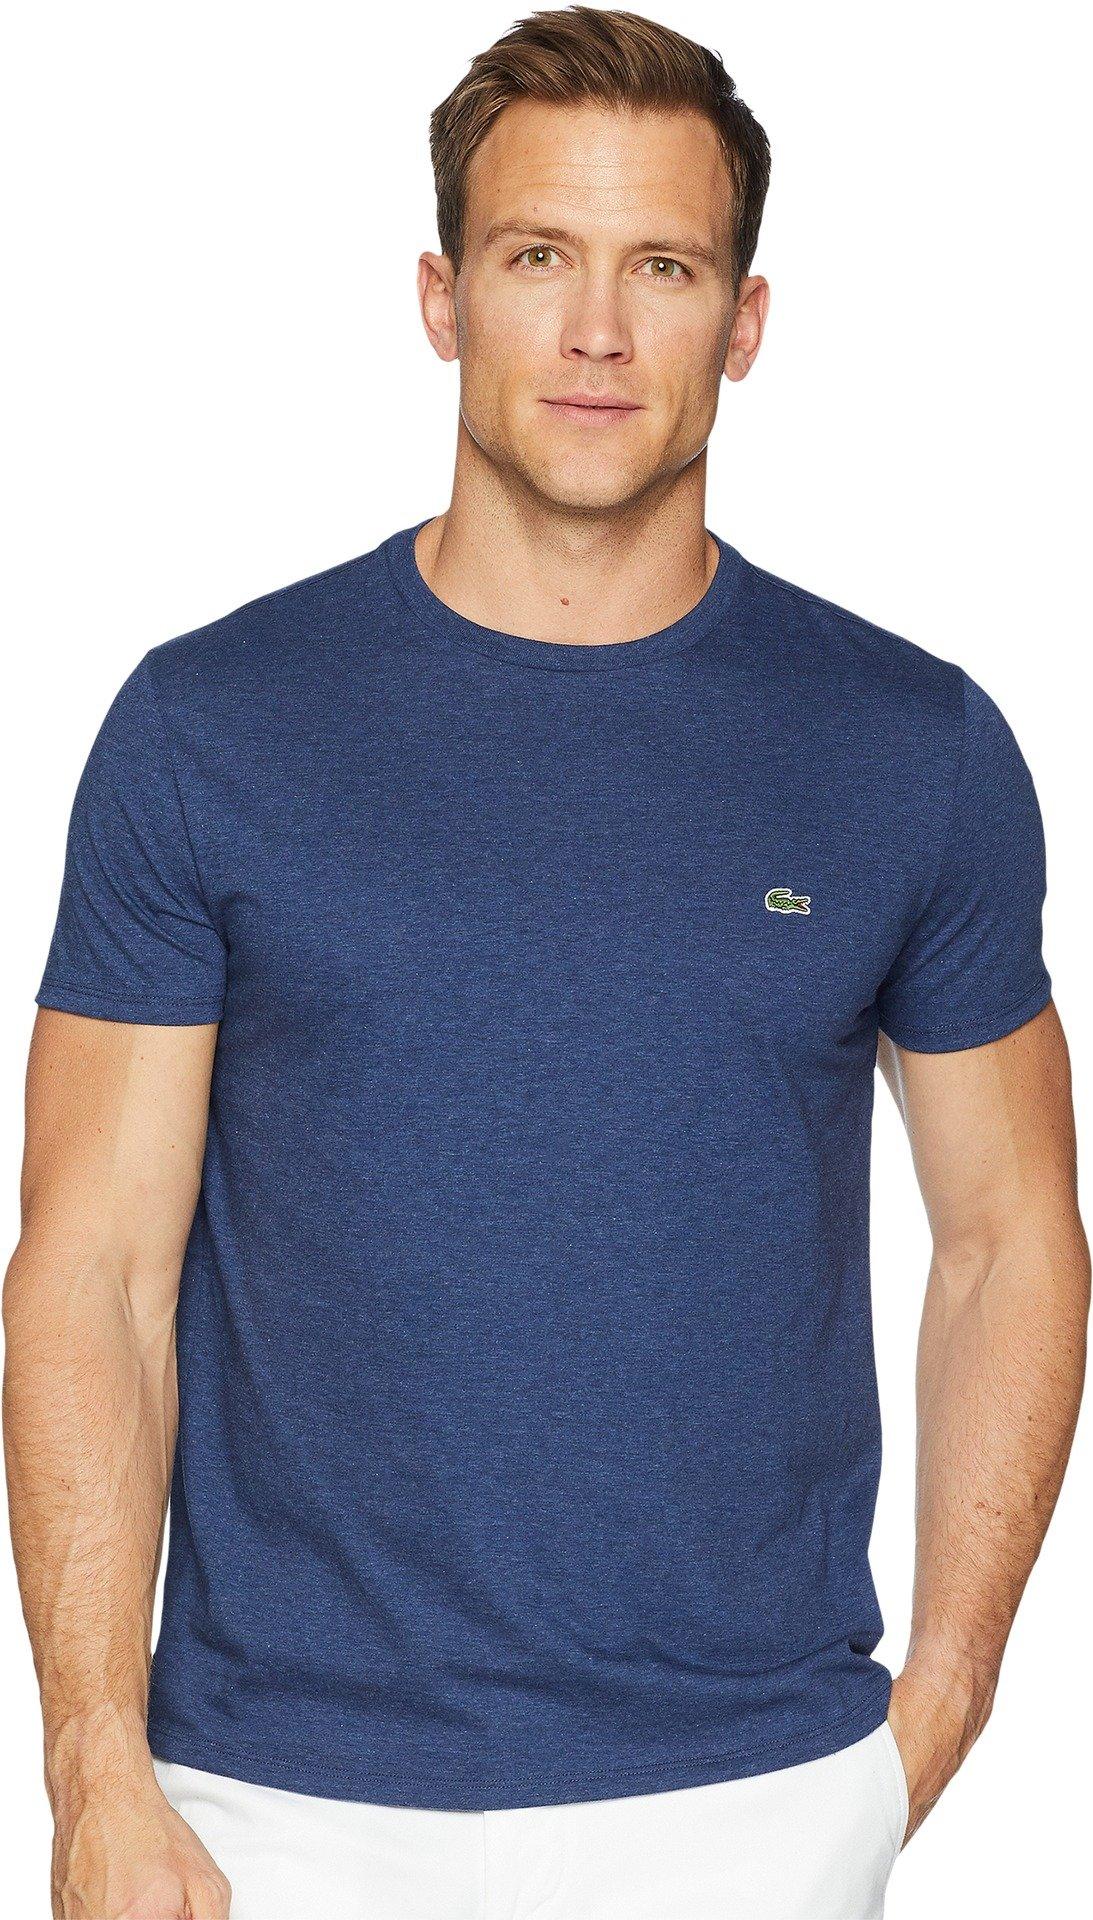 Lacoste Men's Short Sleeve Jersey Pima Regular Fit Crewneck T-Shirt, TH6709-51, Nocturnal Blue Chine, XXX-Large